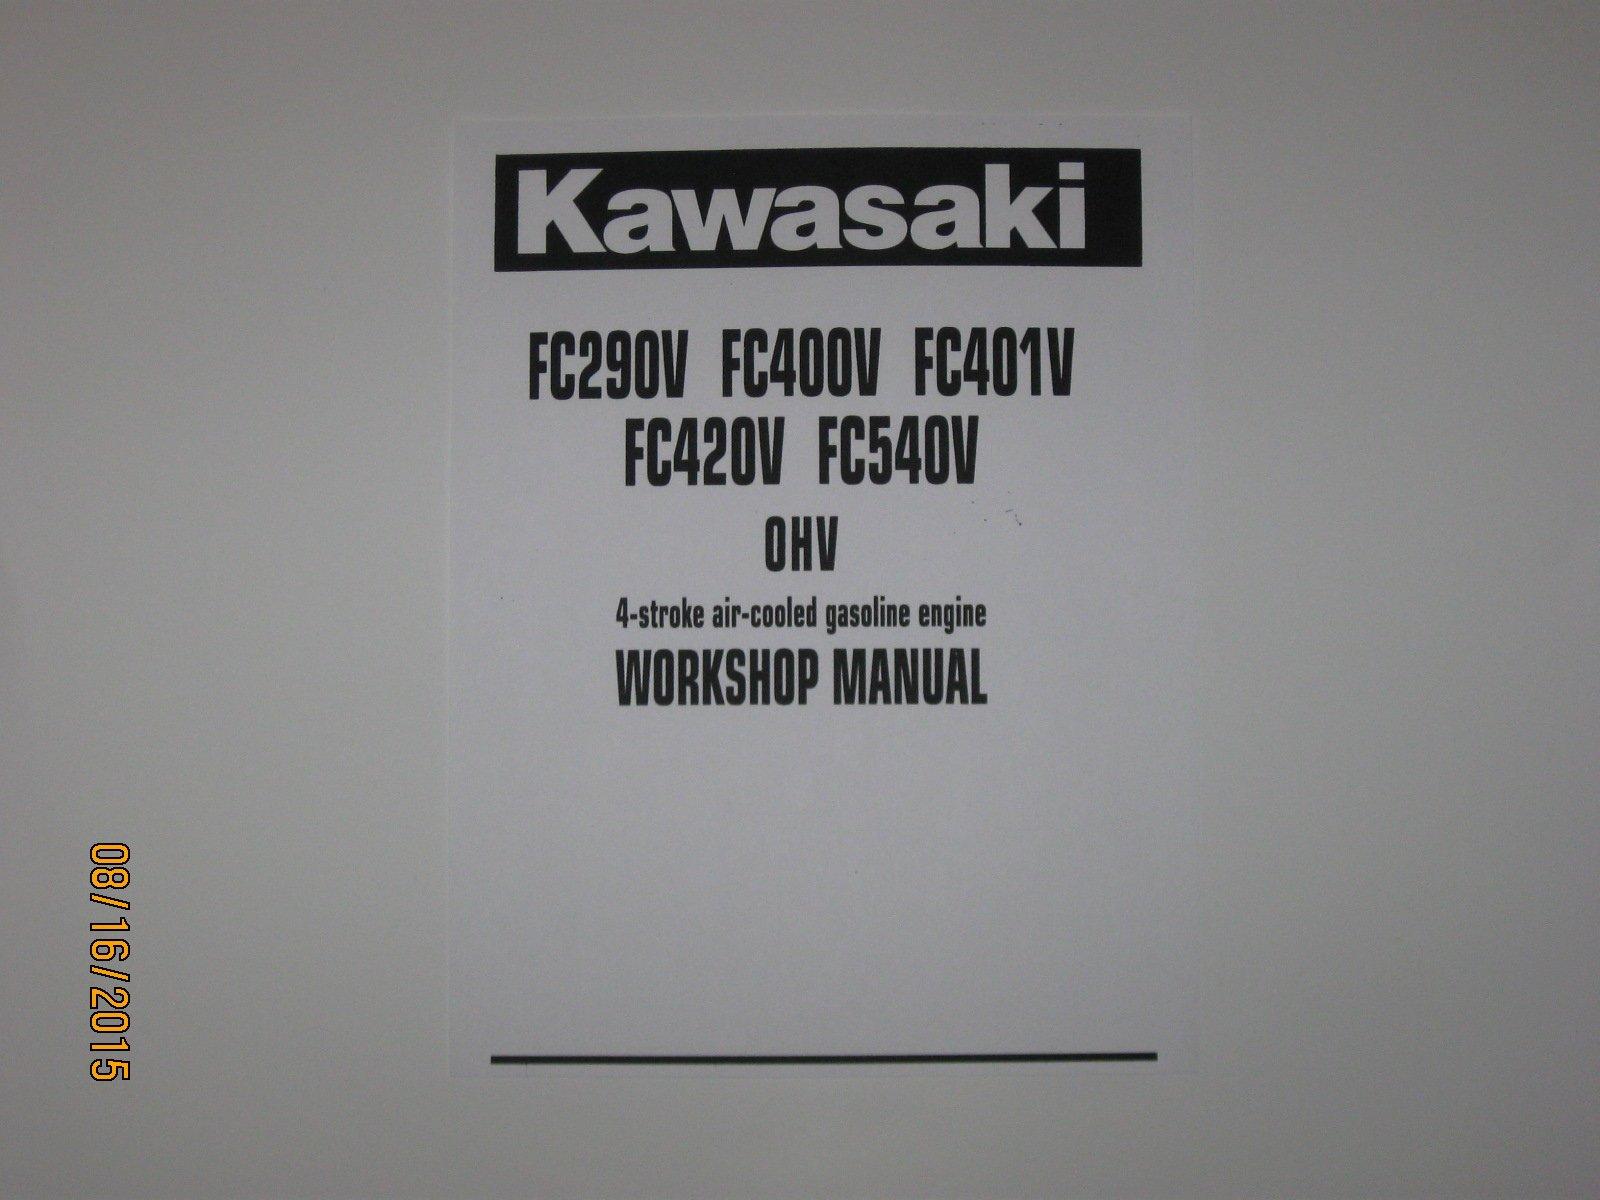 Tondeuse à gazon kawasaki fc290v.